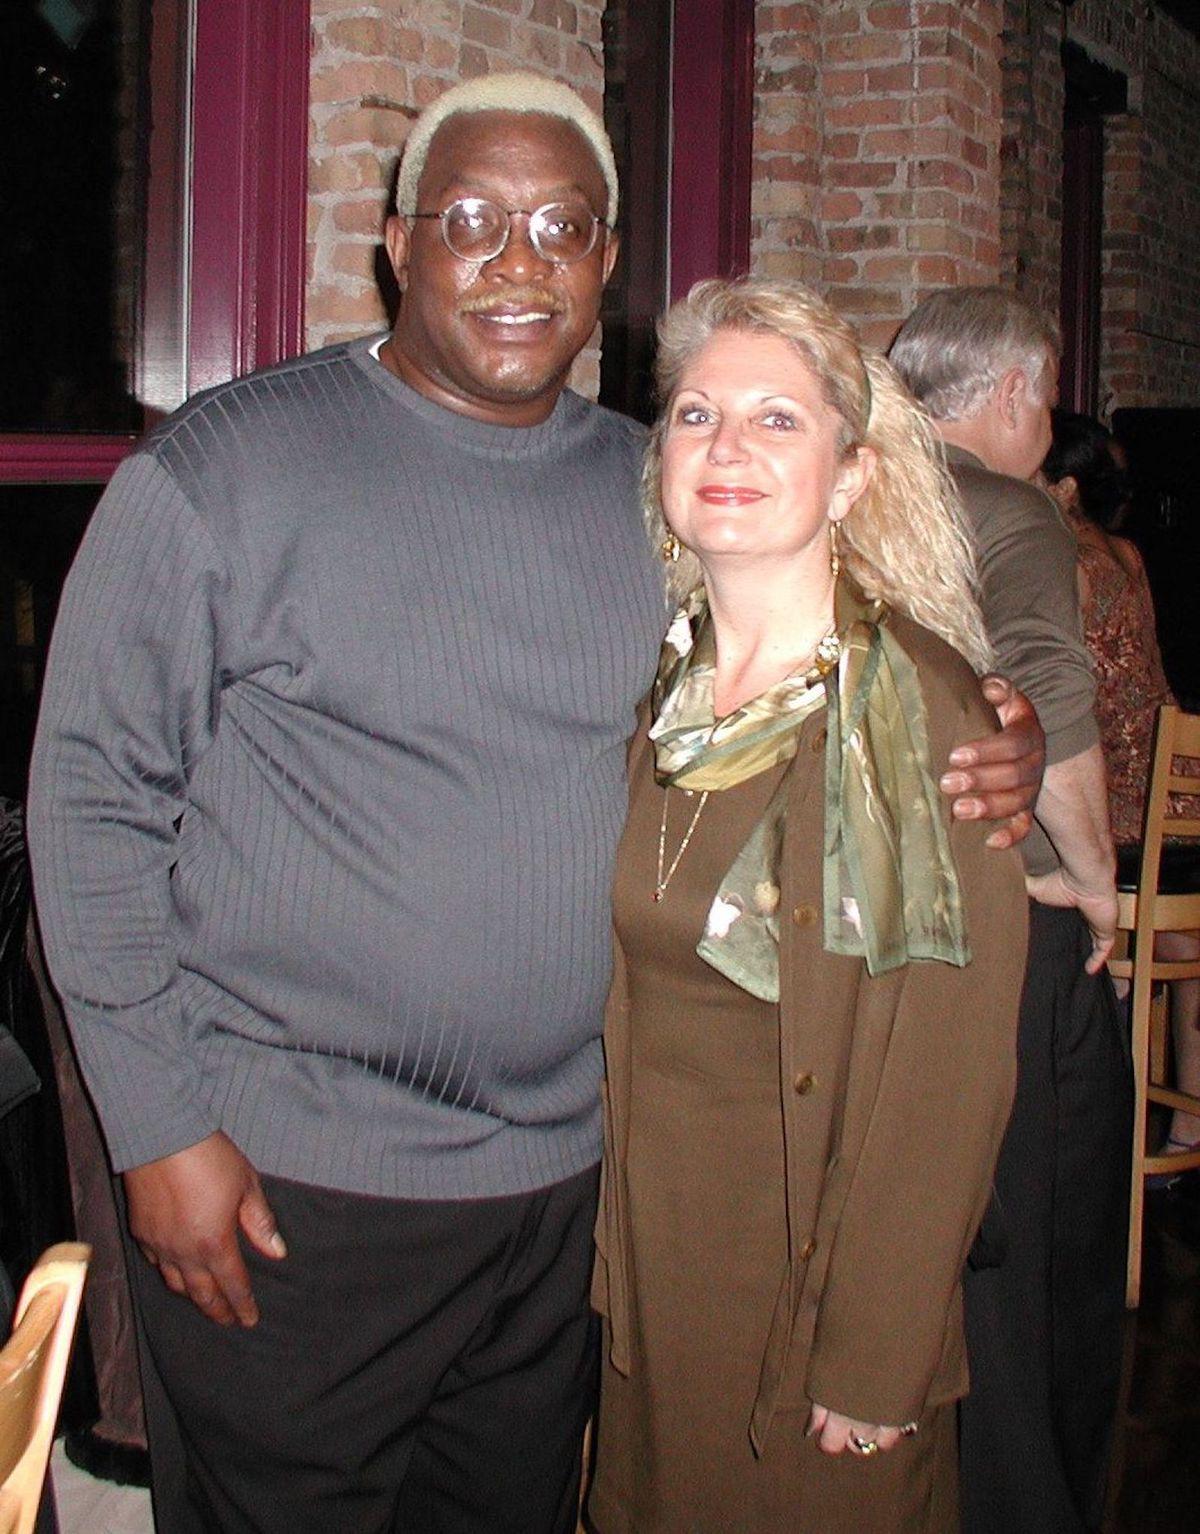 Leroy Hearon and Phoebe Grant.